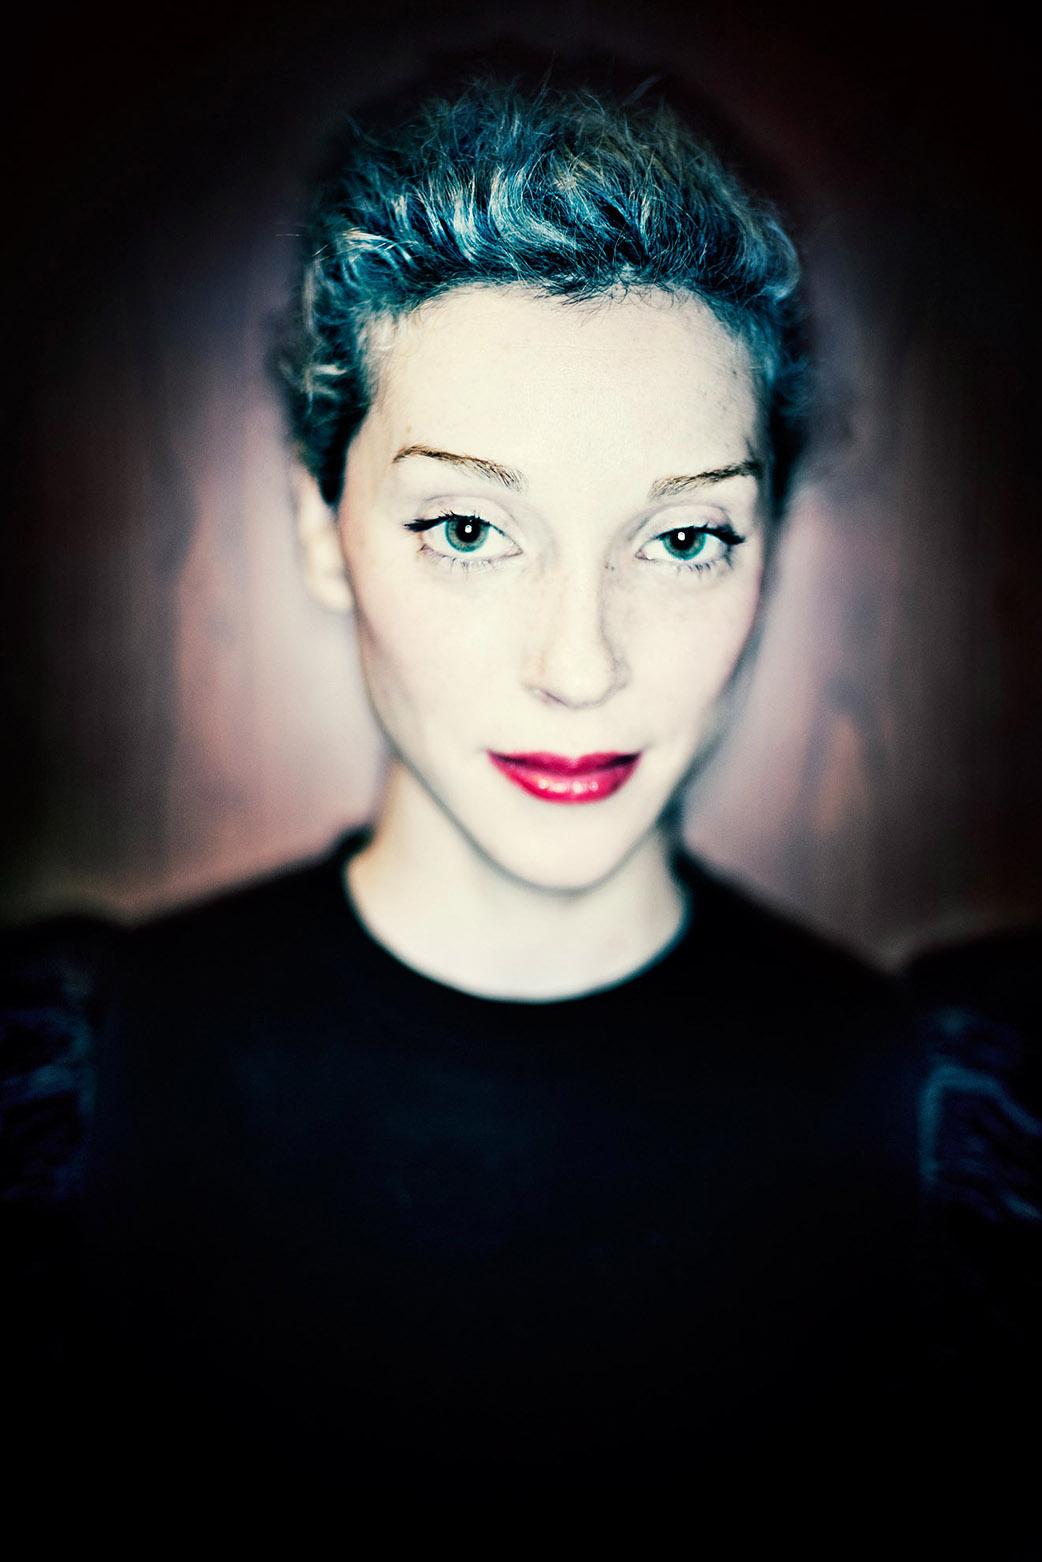 "<a href=""www.imlphotographer.com/site"" target=""_blank"">Foto Ilaria Magliocchetti Lombi</a>"